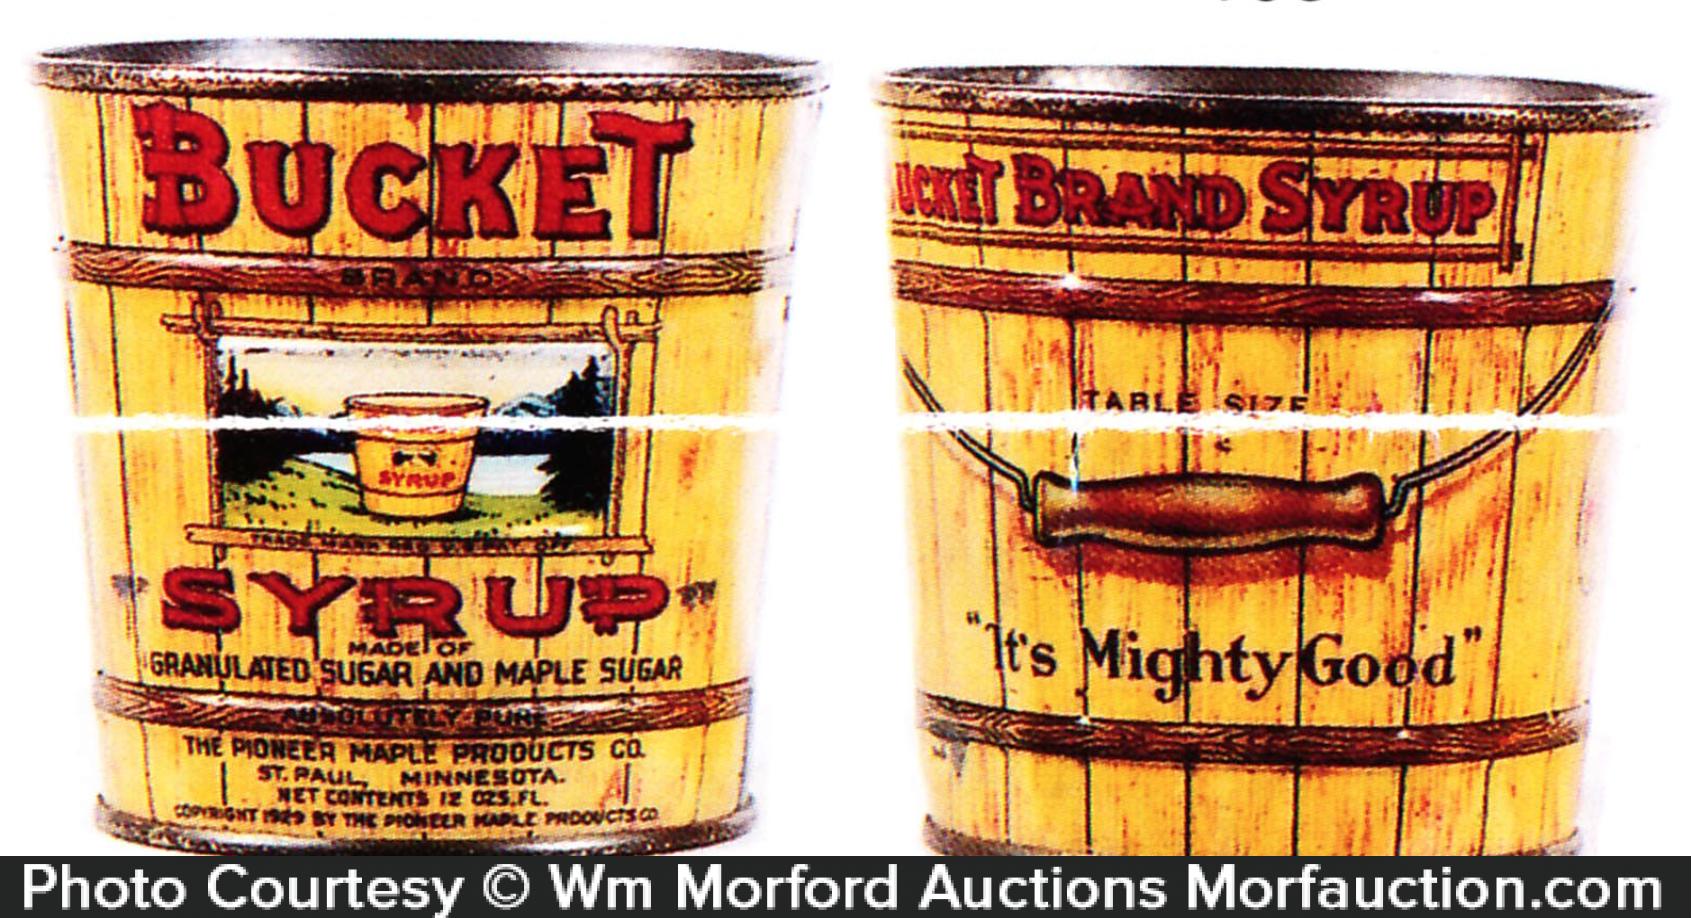 Bucket Syrup Tin